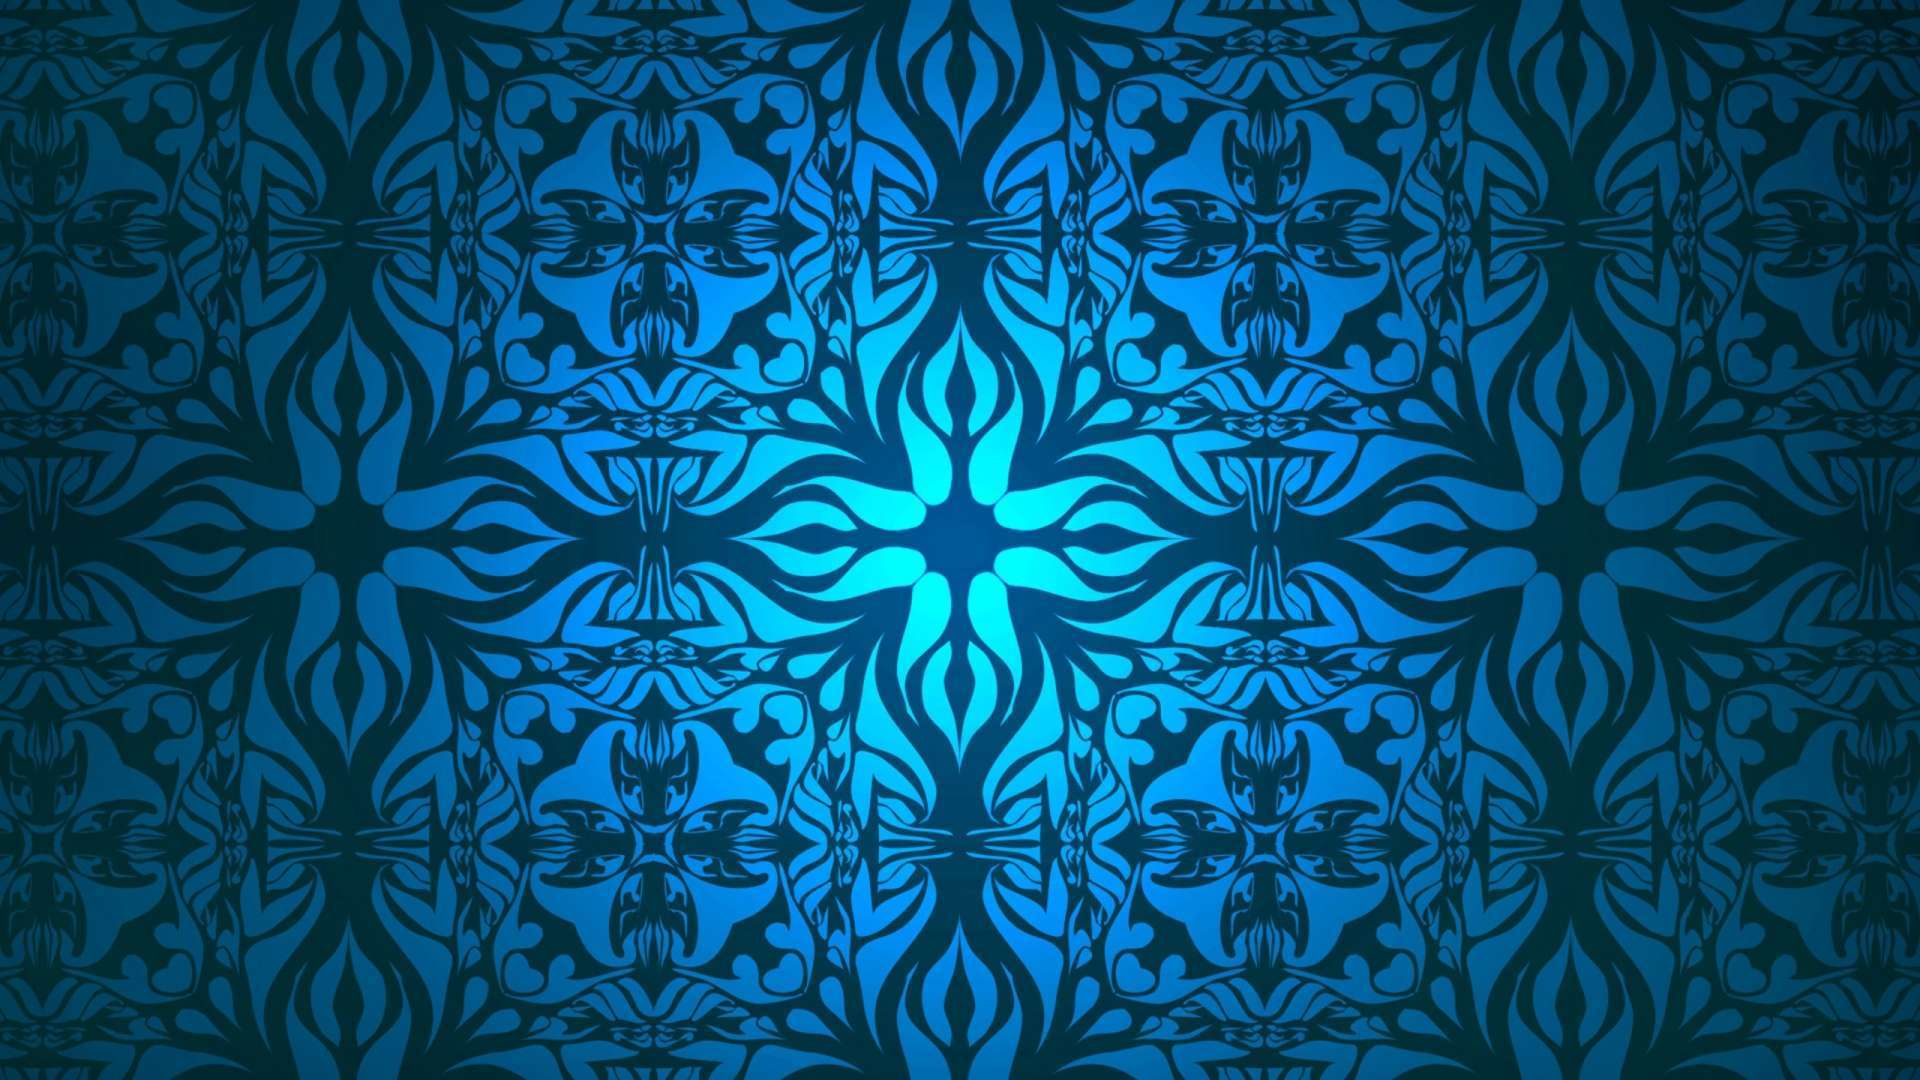 Wallpaper Patterns Blue White Hd Wallpaper 1080p Upload at July 3 1920x1080